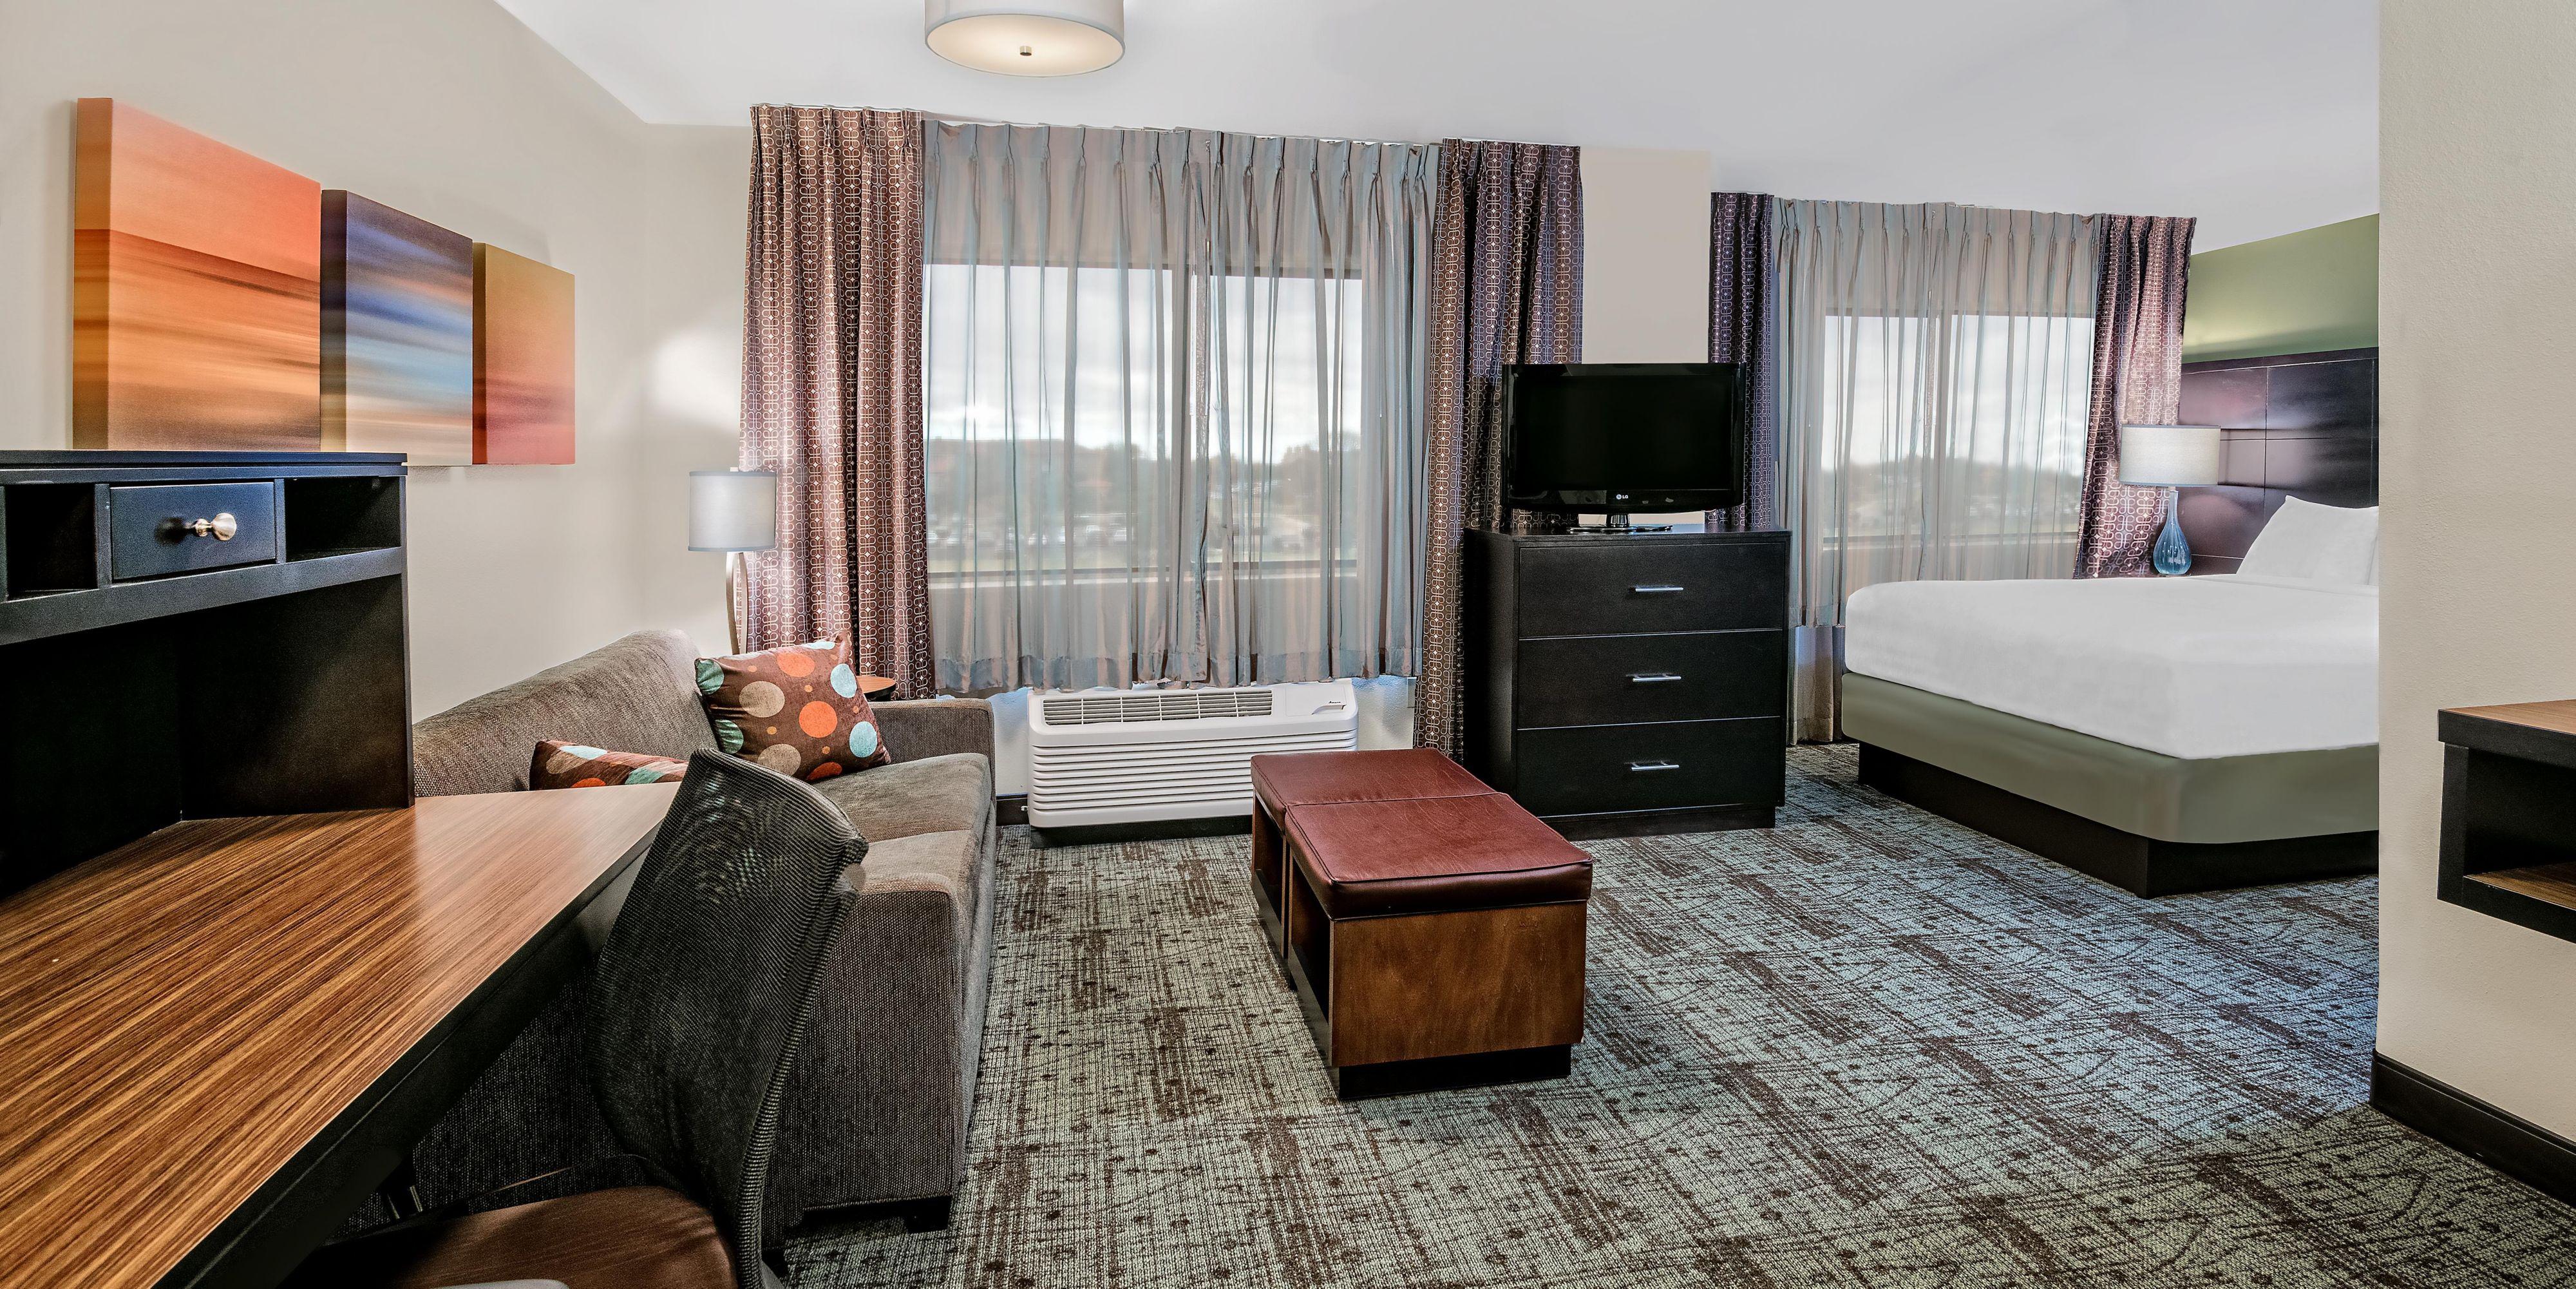 Staybridge Suites Lubbock image 1